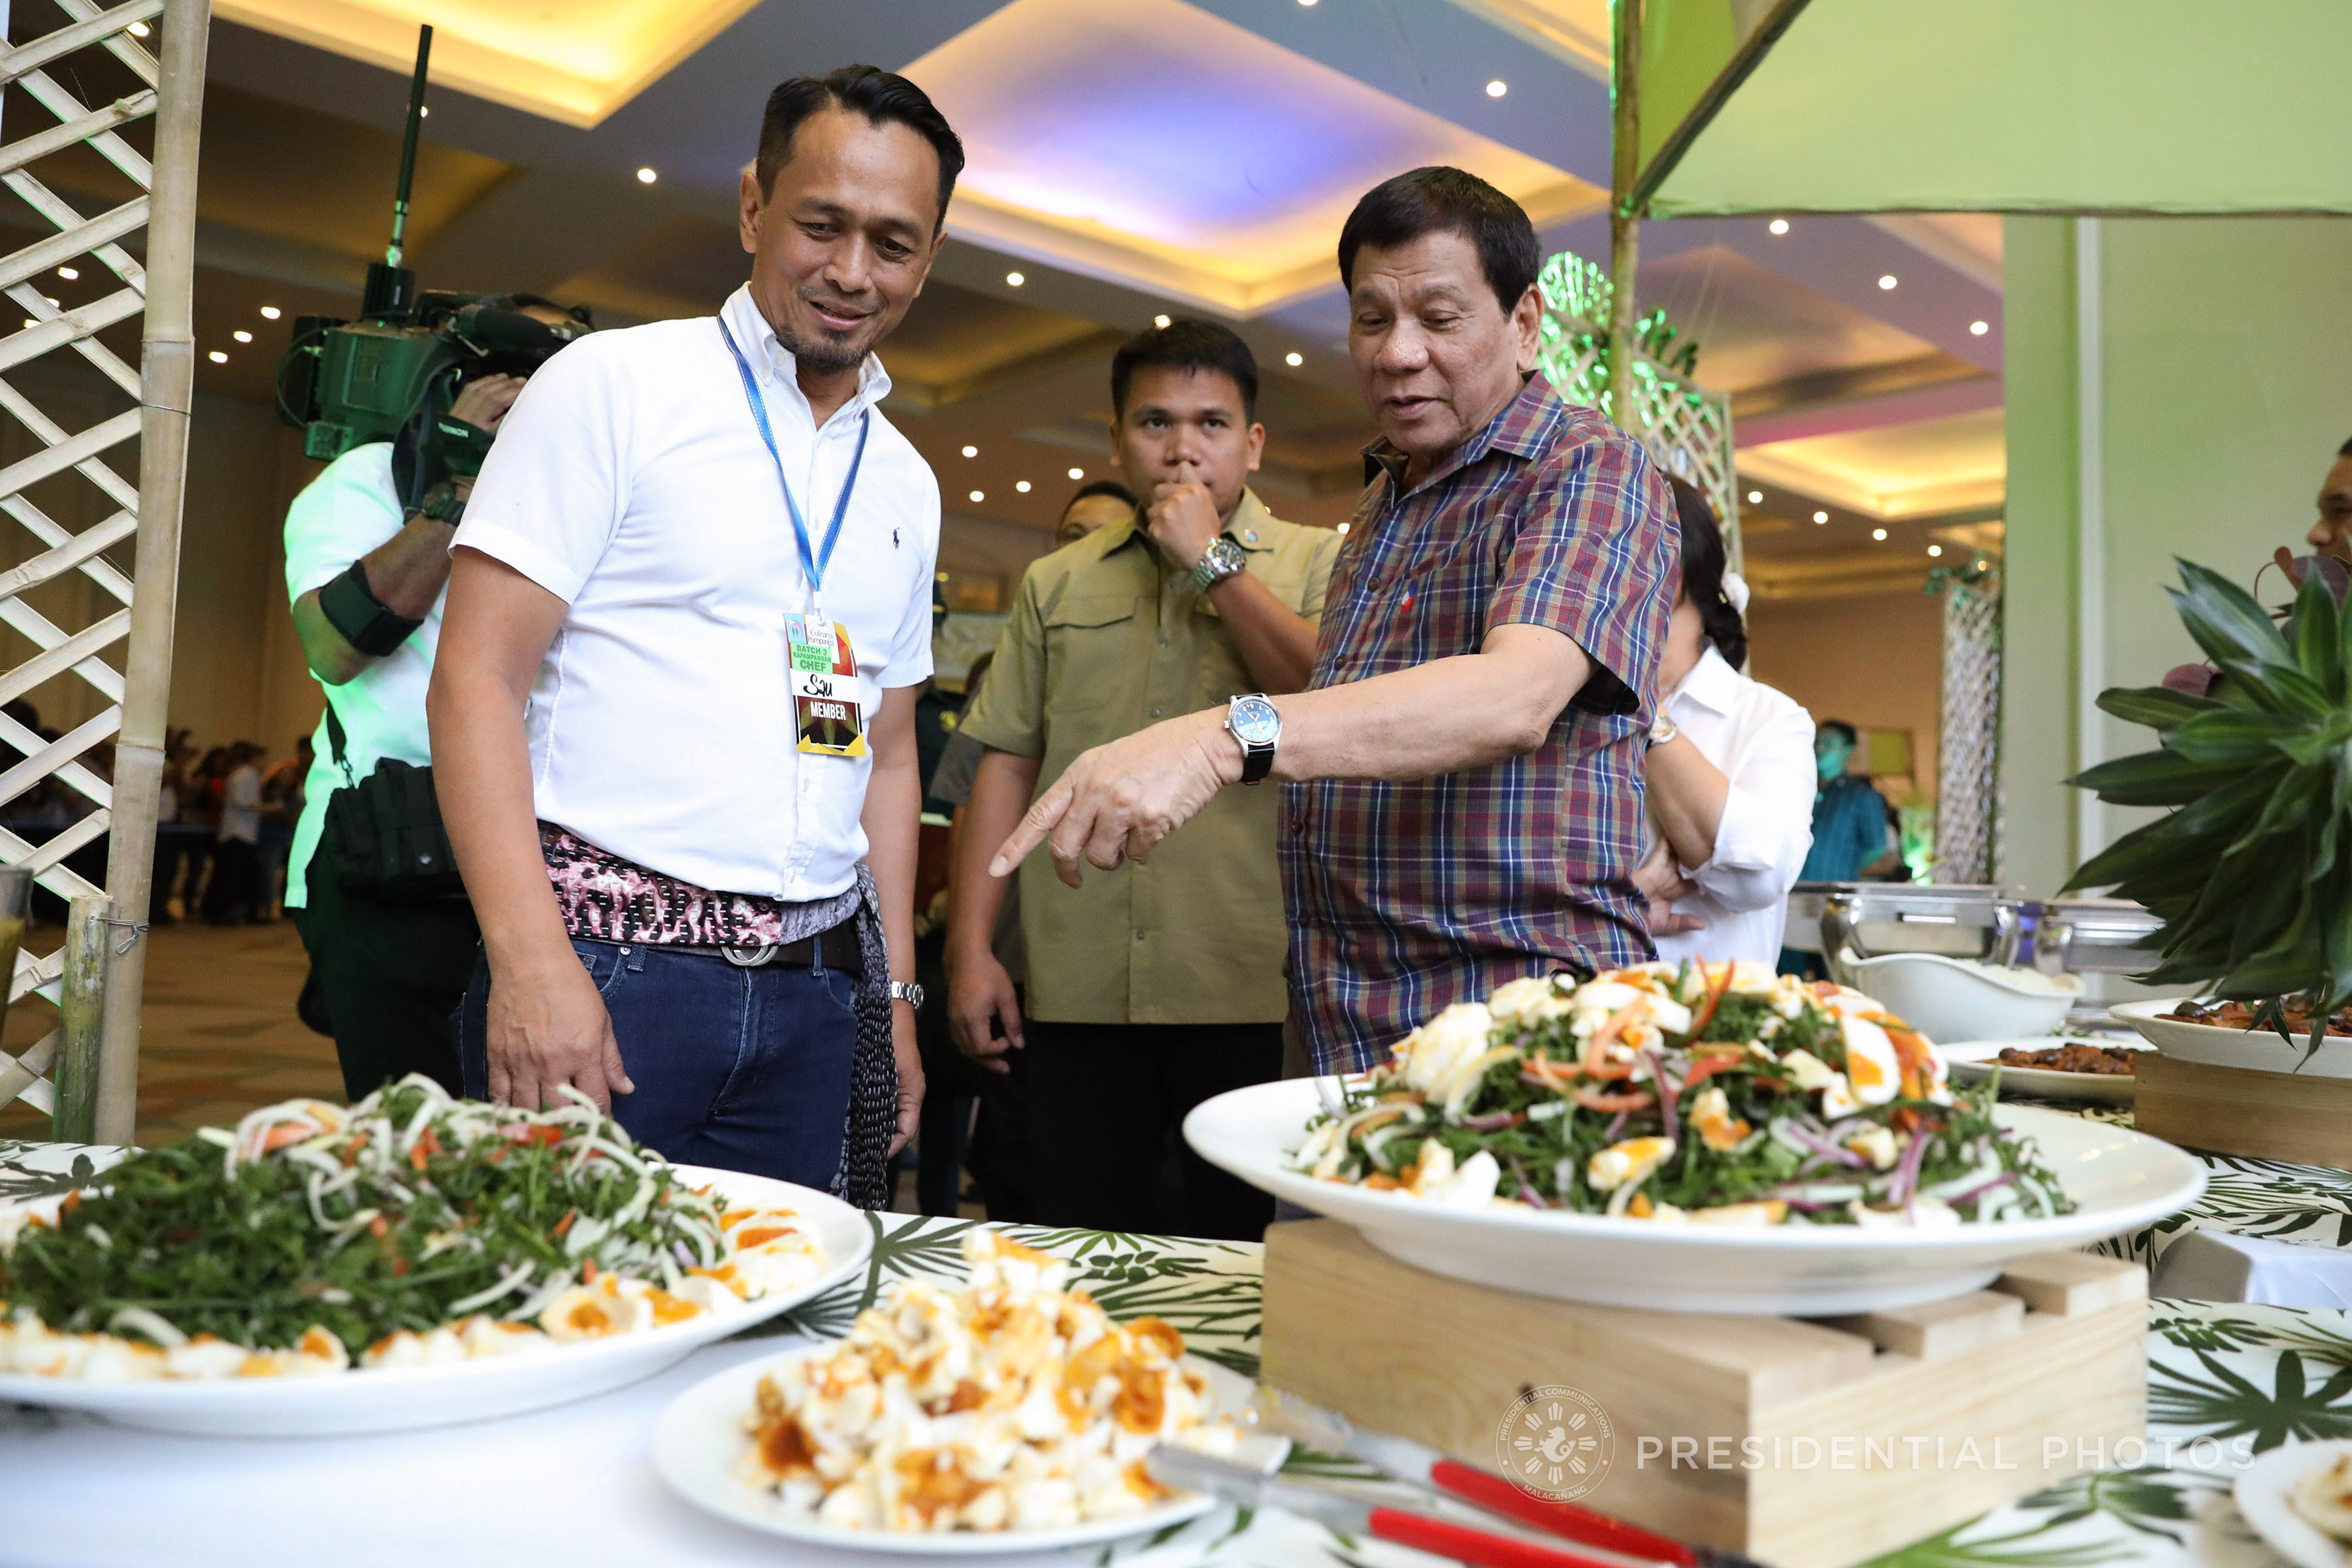 President Rodrigo Roa Duterte visits one of the food kiosks showcasing authentic Kapampangan cuisine during the Kapampangan Food Festival held at the ASEAN Convention Center in Clark, Pampanga on December 7, 2017. (Photo by Rolando Mailo/Presidential Photo)